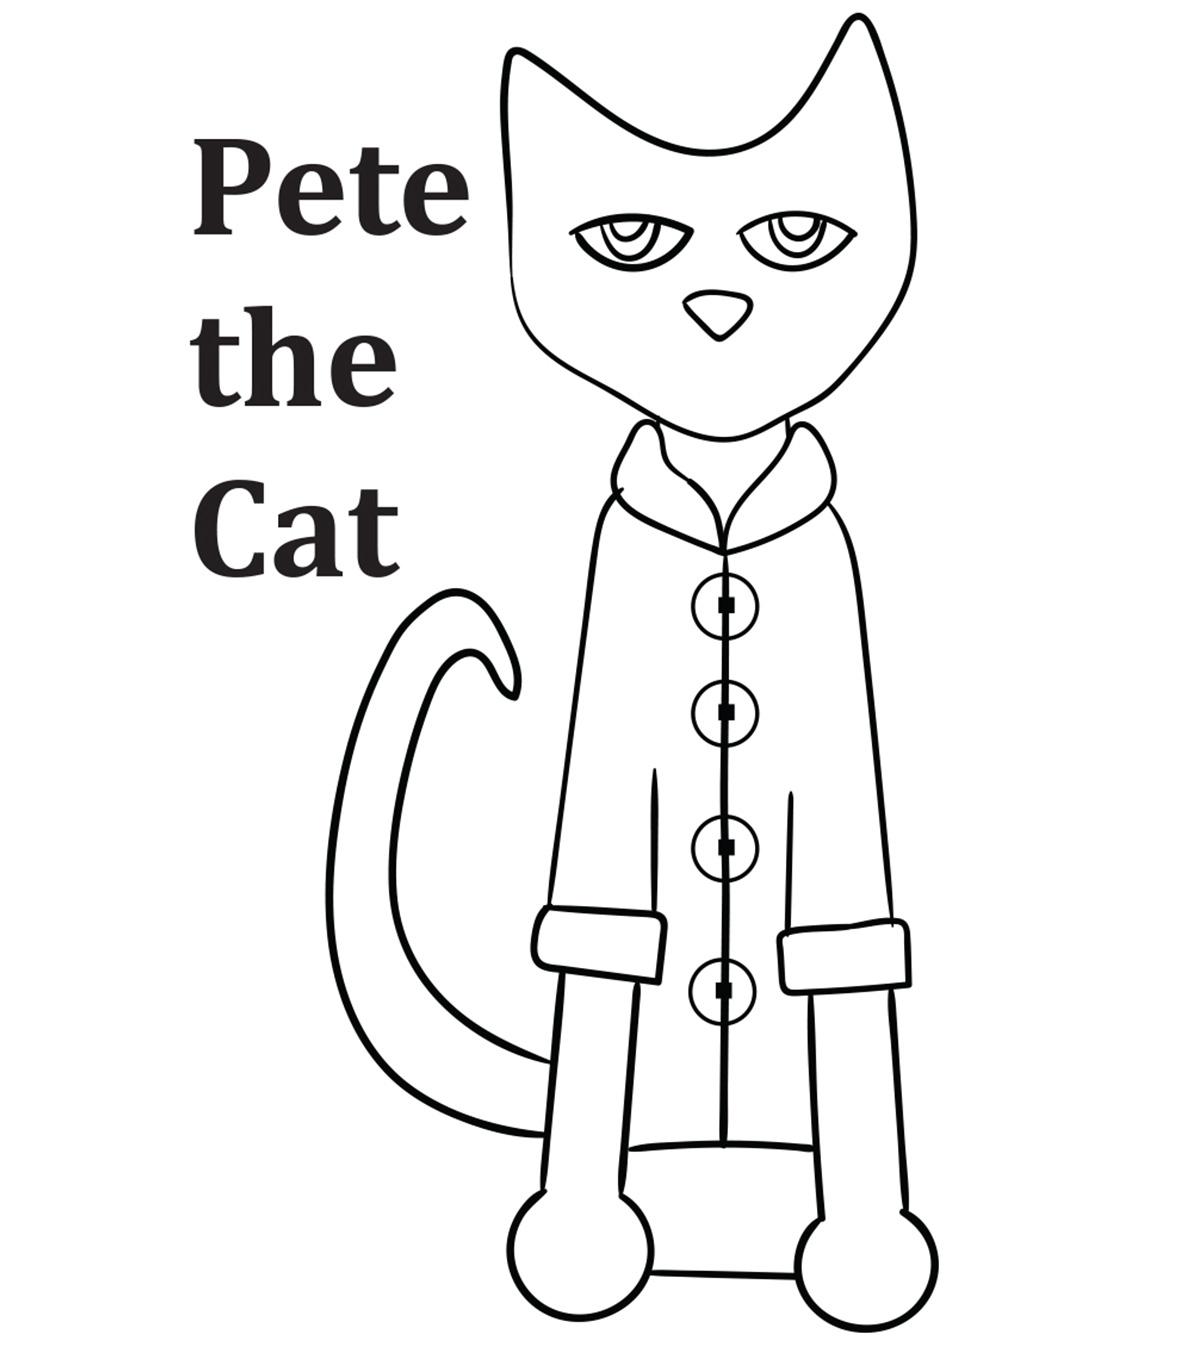 Pete o gato